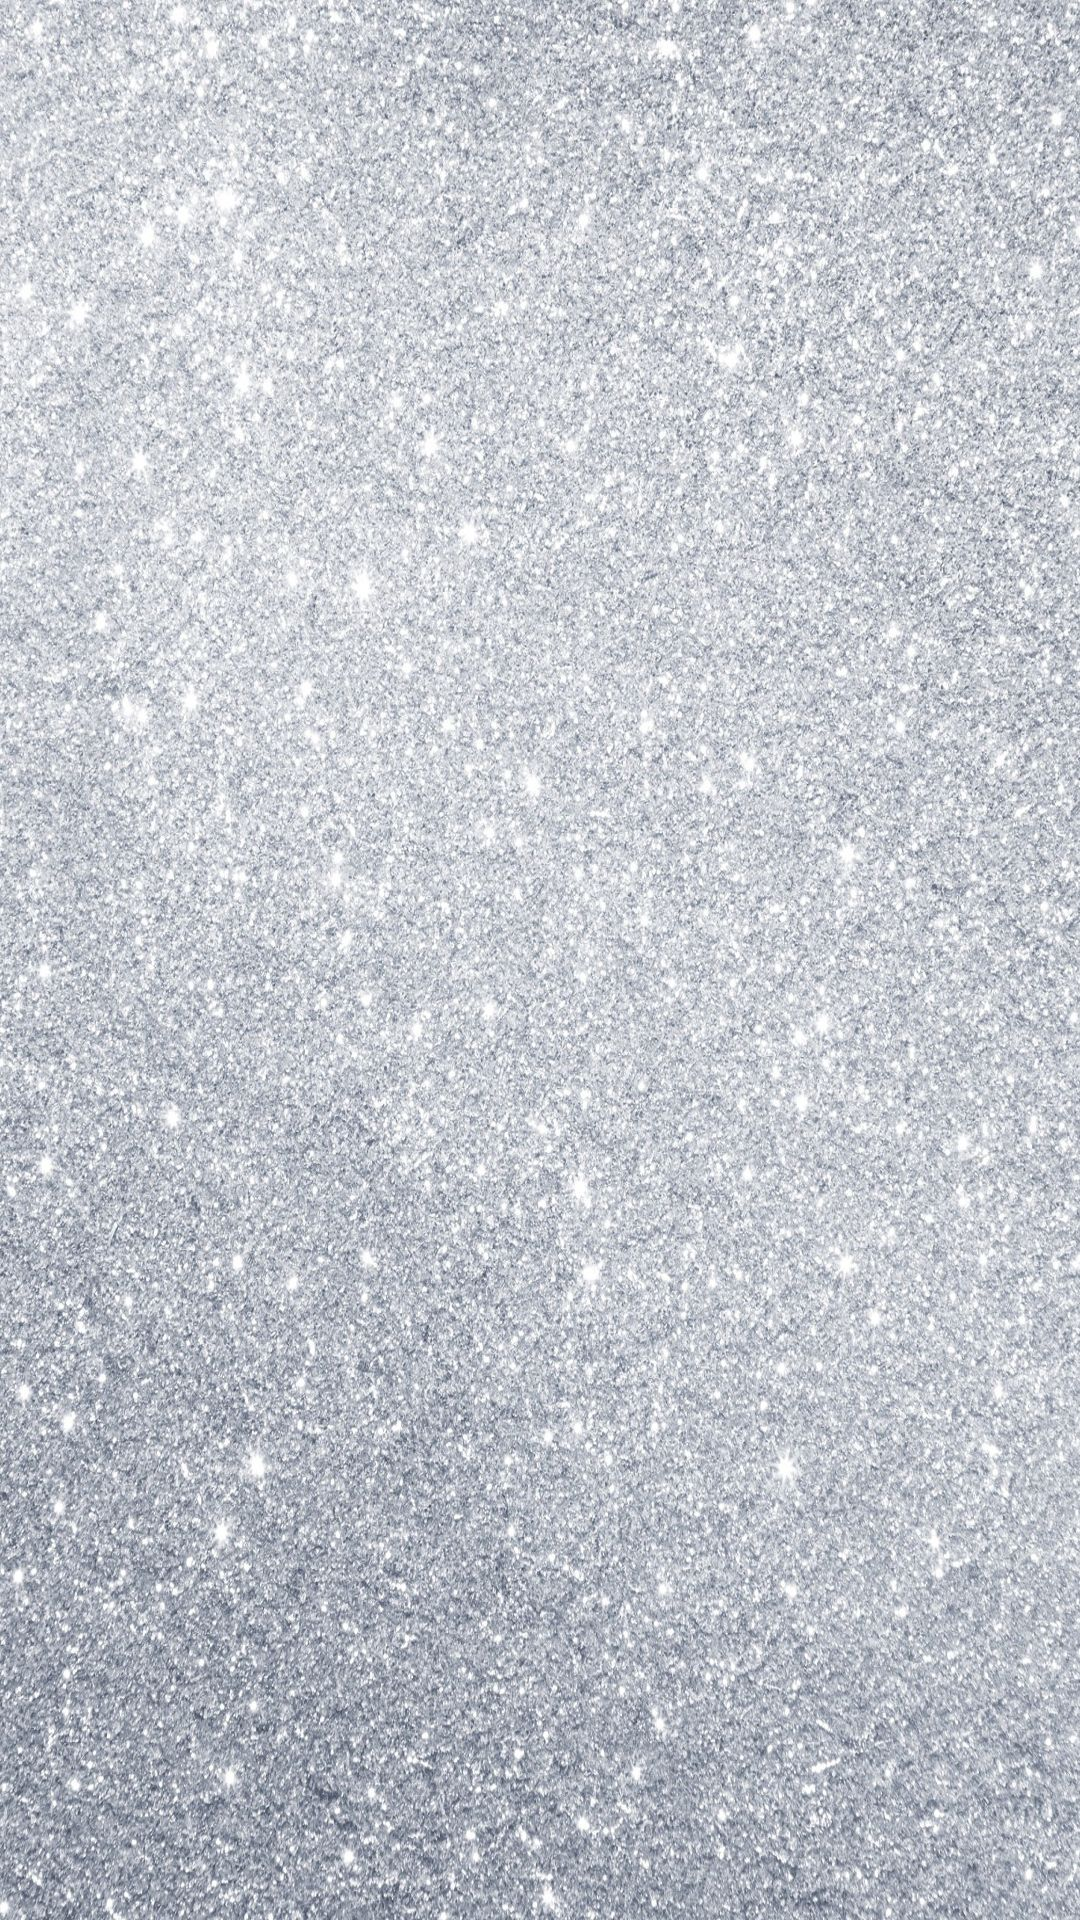 silver sparkly glitter background wallpaper Grey